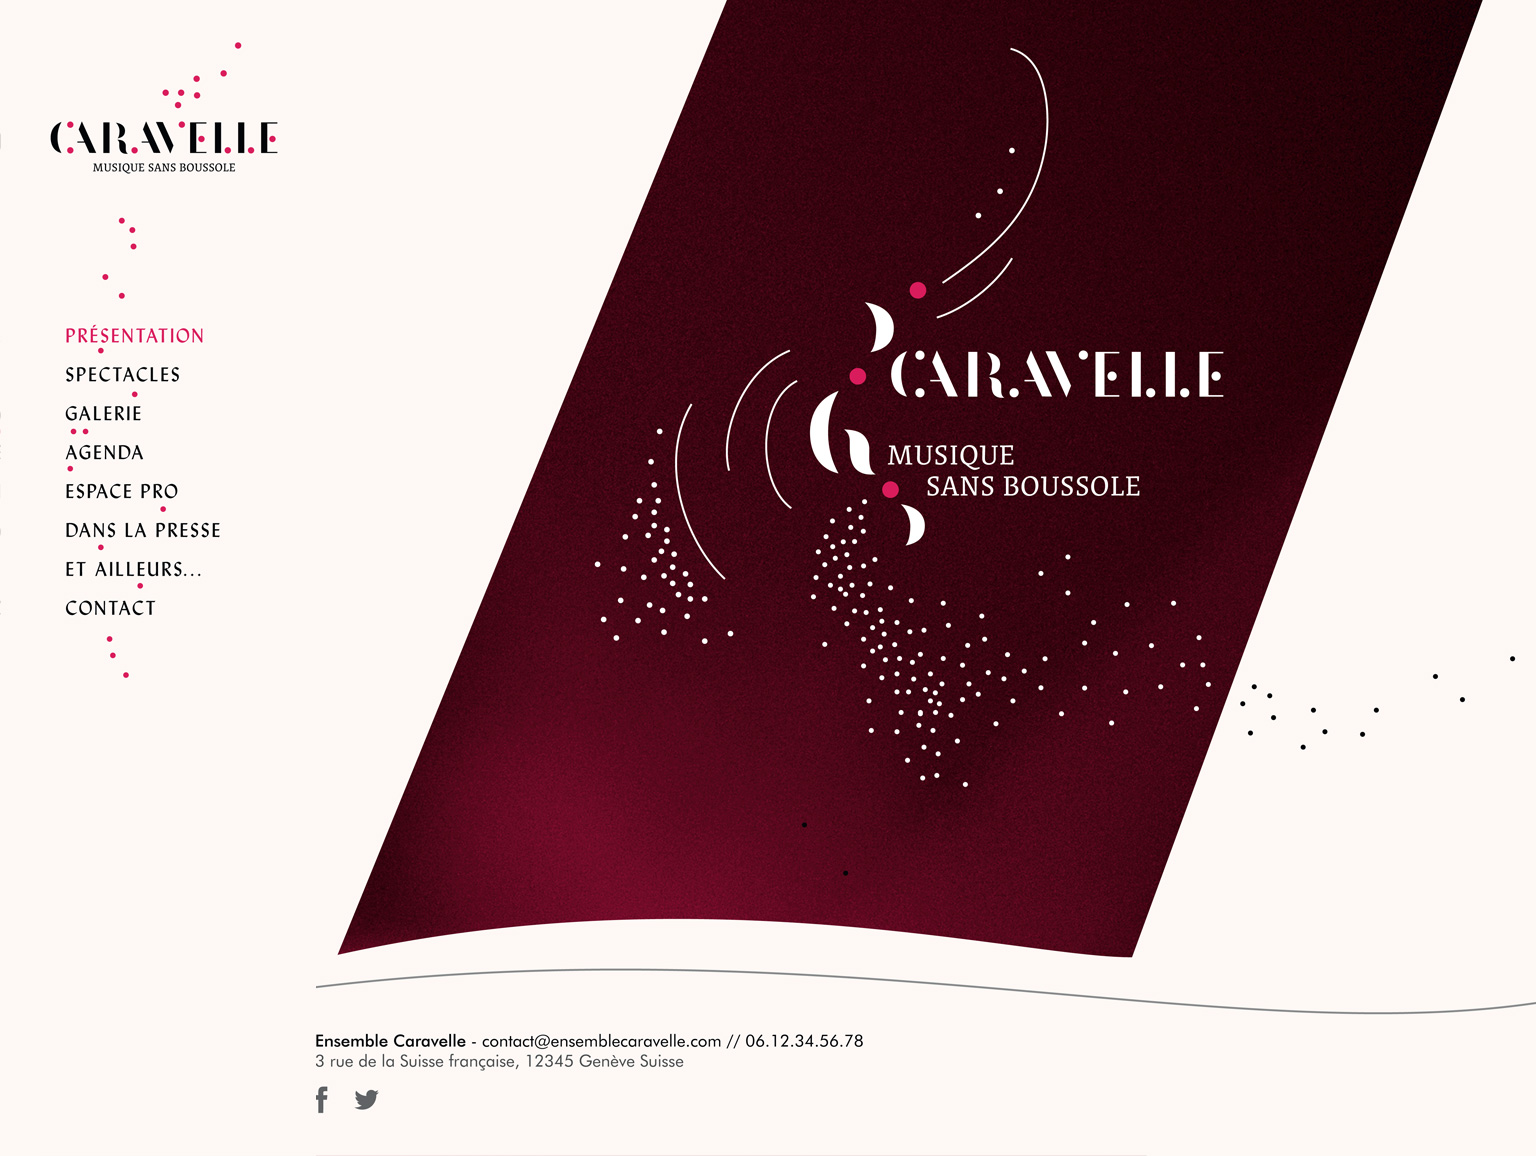 caravelle-site1